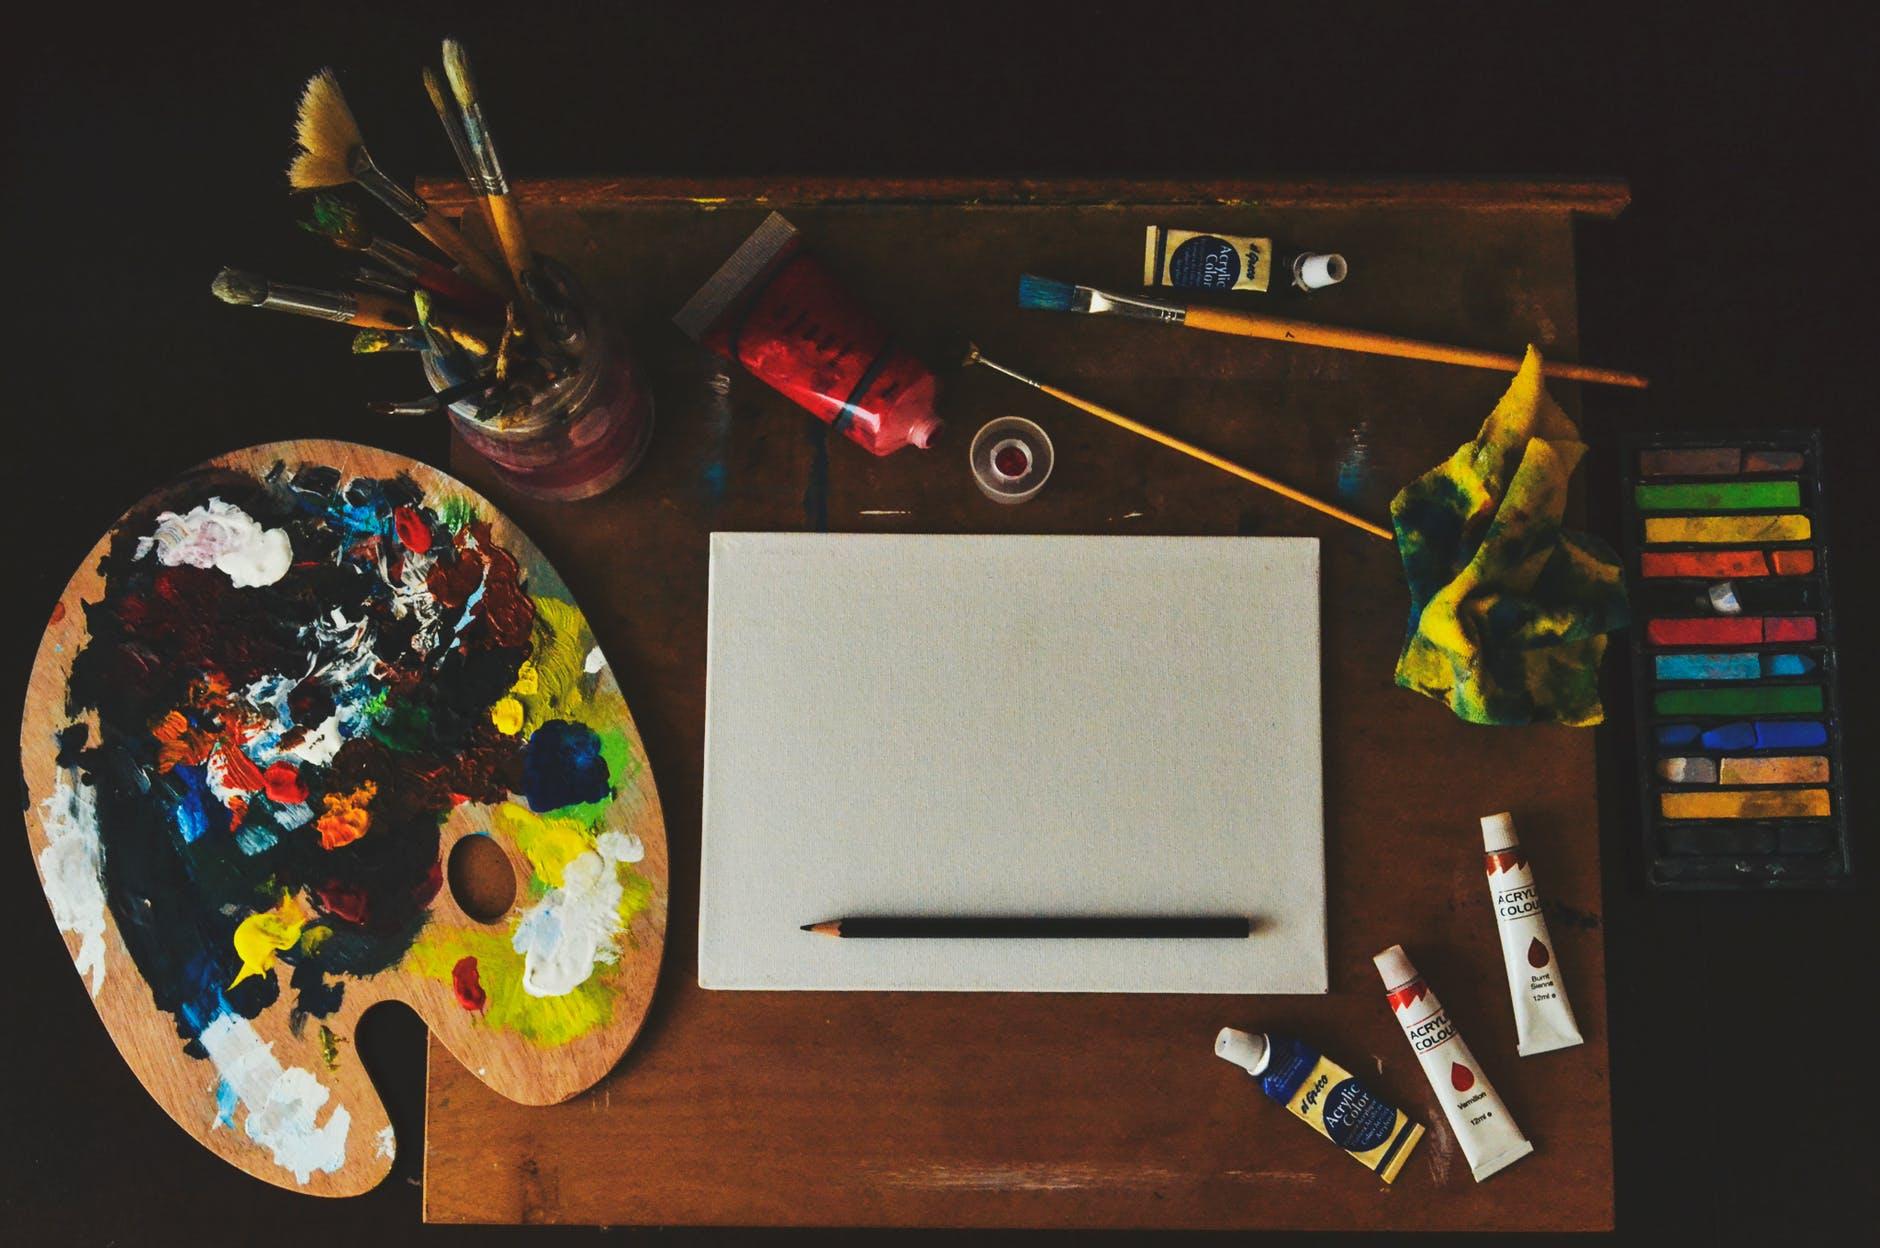 Hone Your Crafting Skills at 7 Art Centres in Selangor